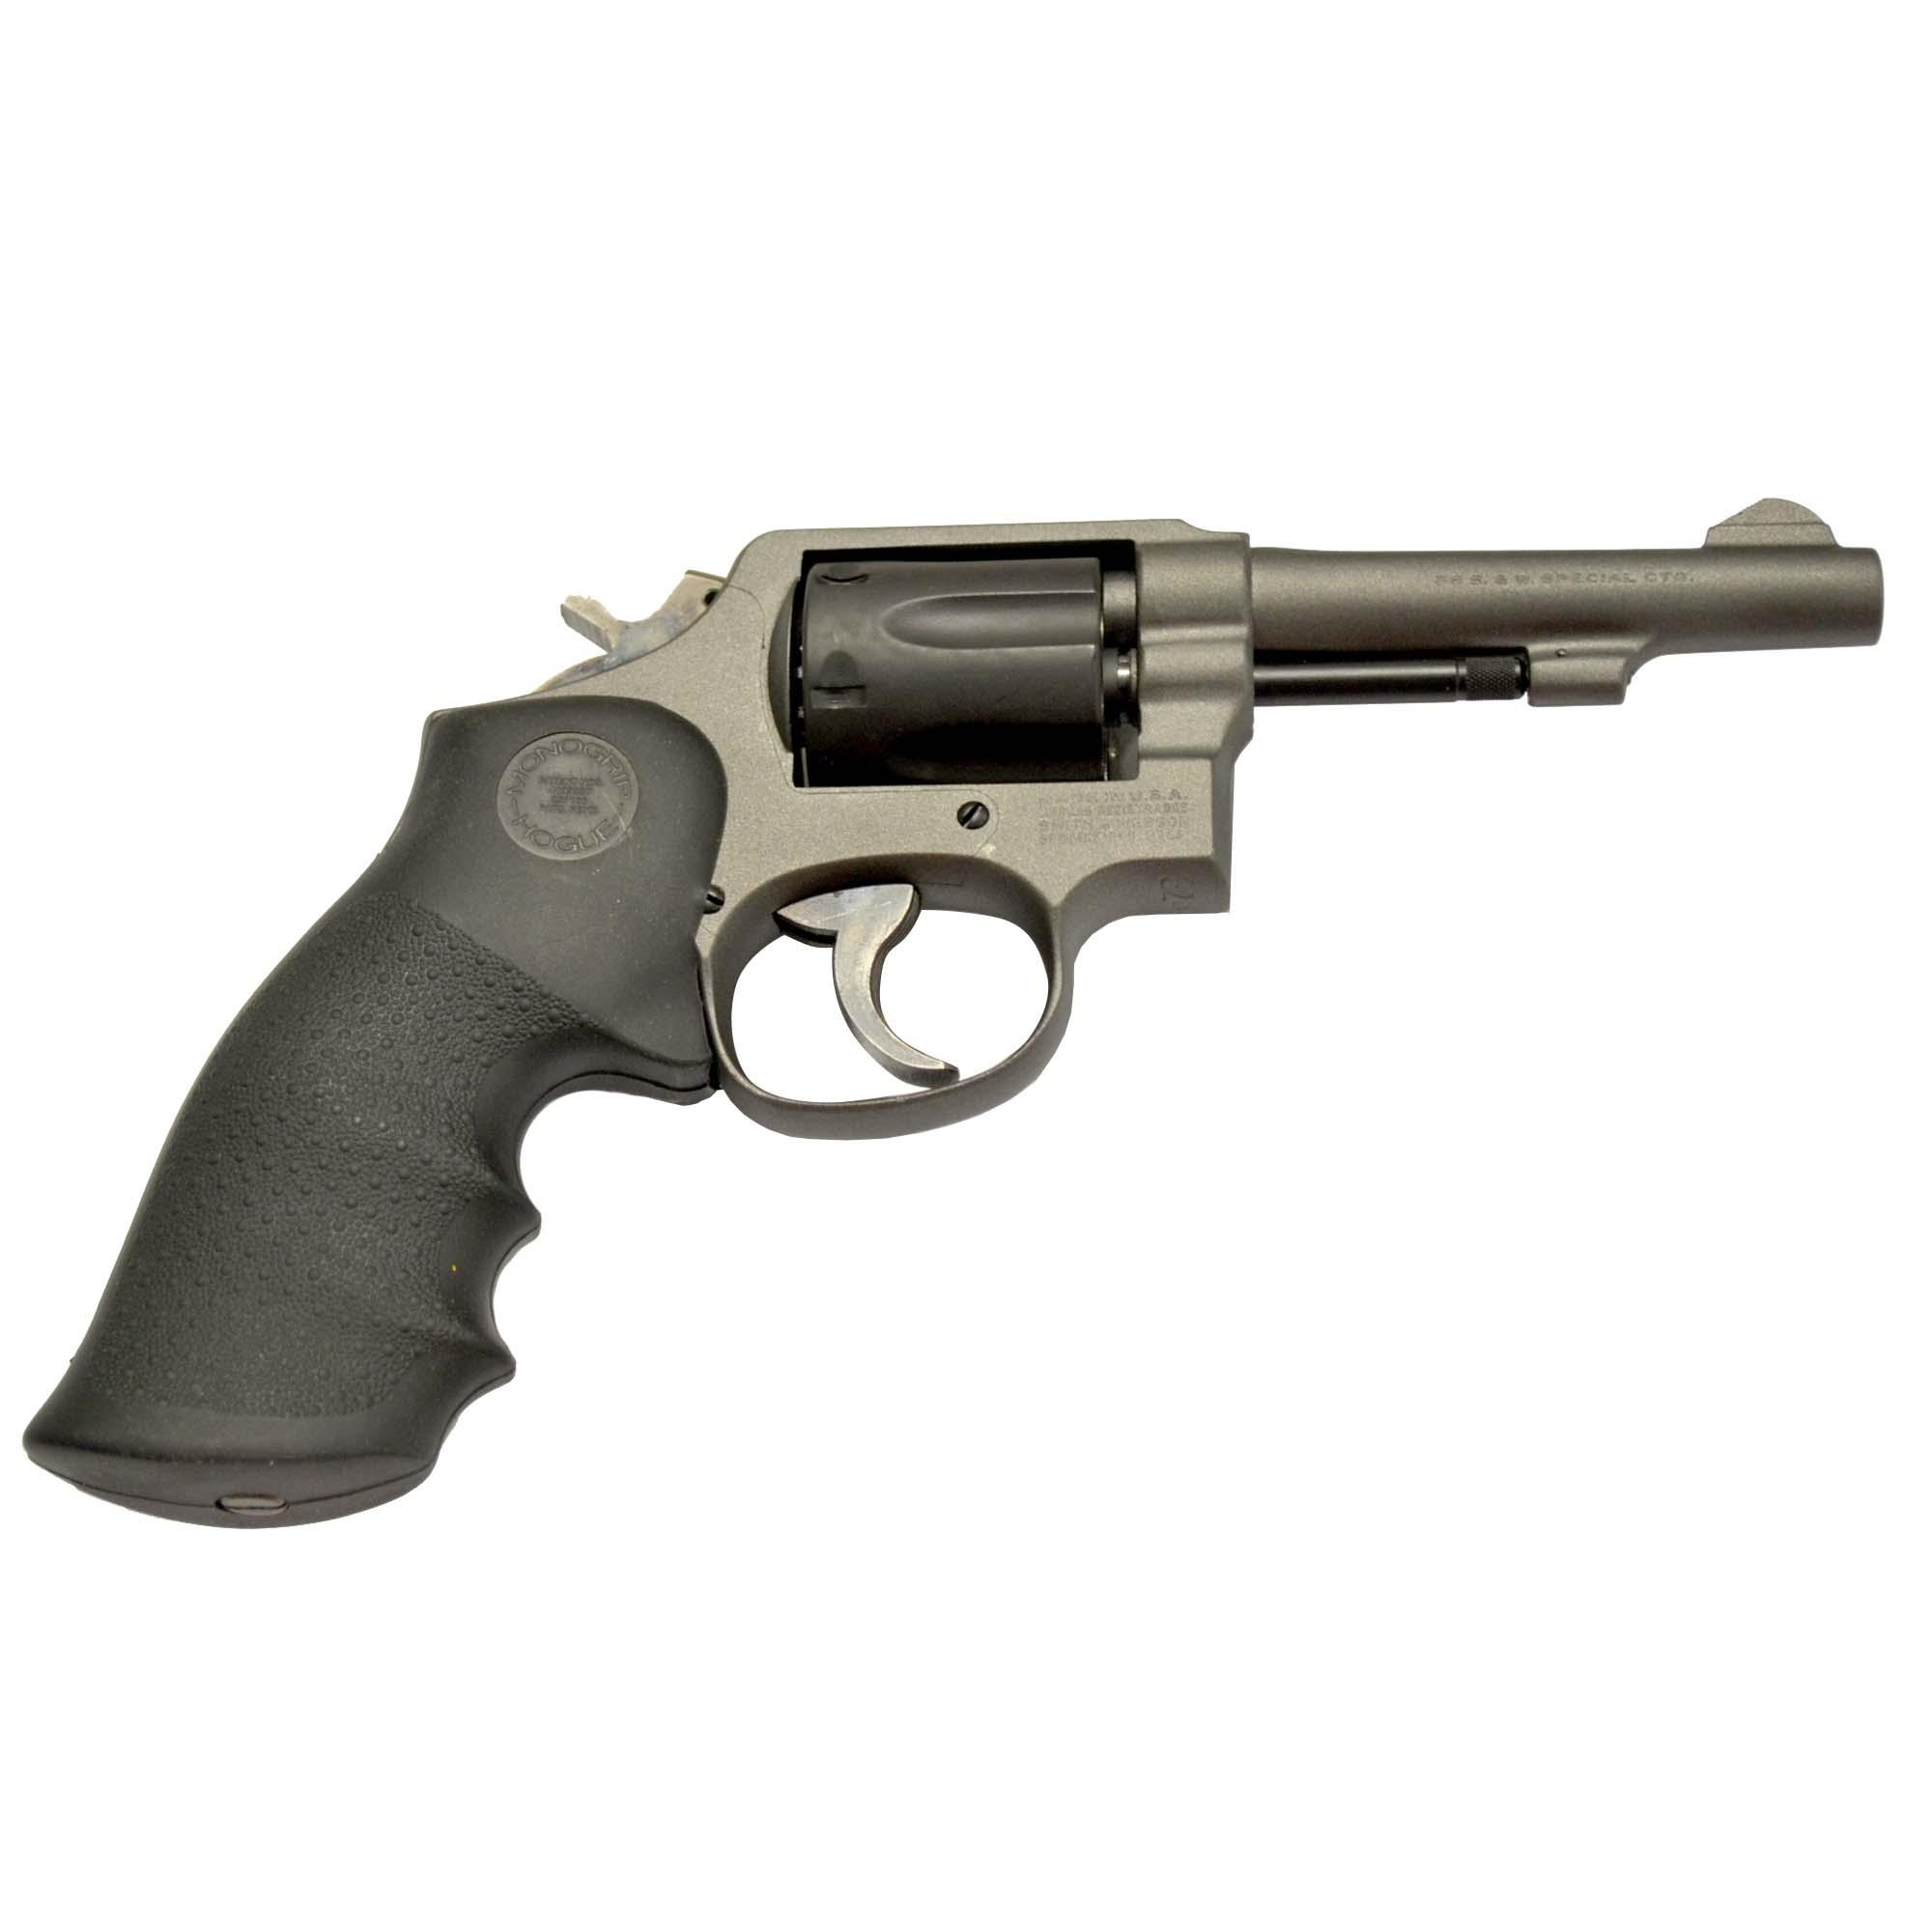 Used Smith & Wesson Model 10-7 Revolver, .38 Special, Cerakote